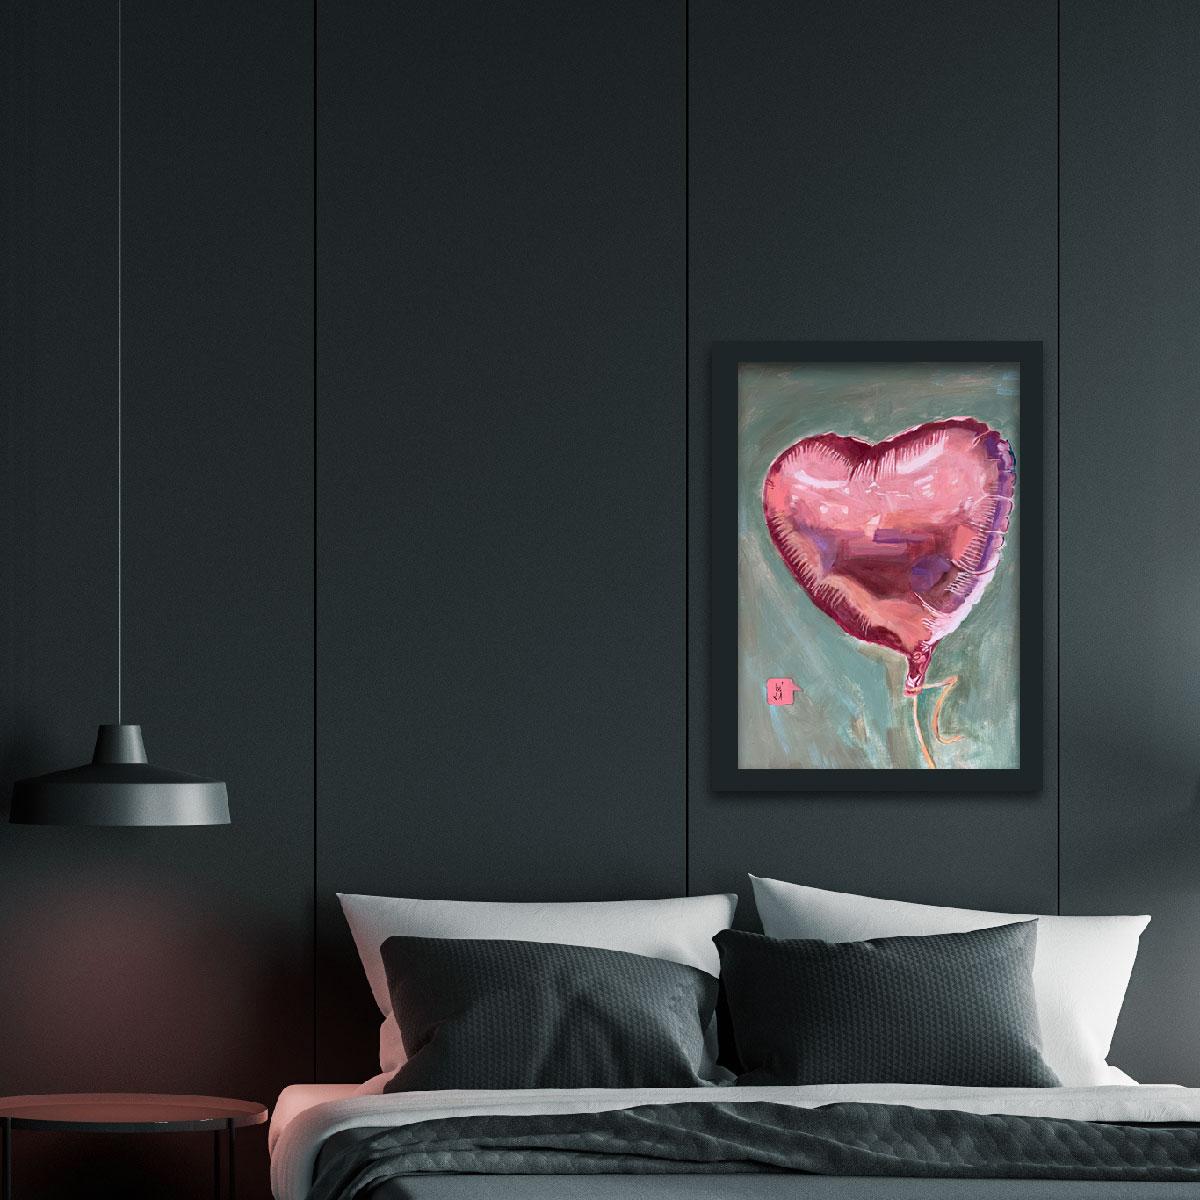 Rosa Luftballon In Herzform